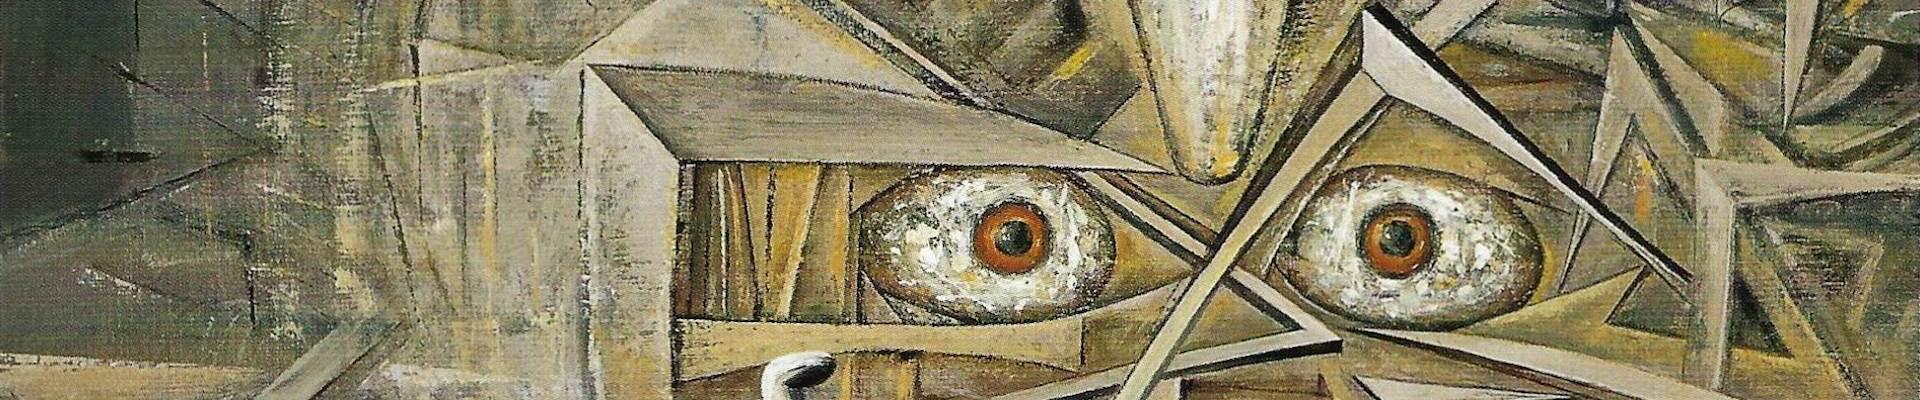 Victor Brauner, Disintegration of Subjectivity, 1951 (detail)